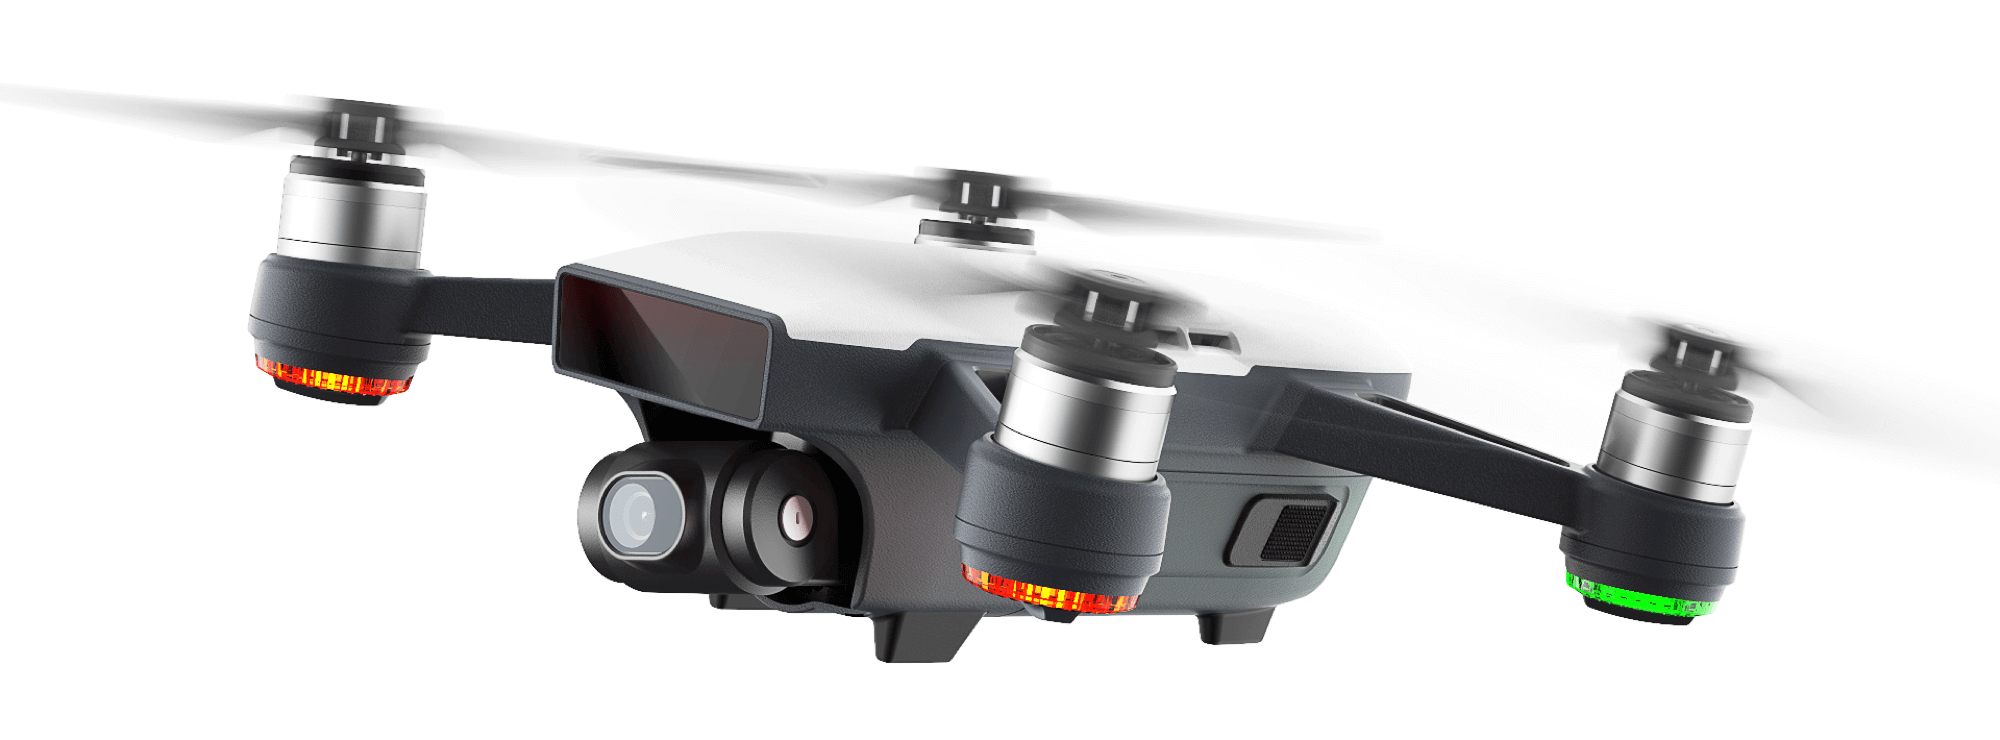 avoi drone dji spark